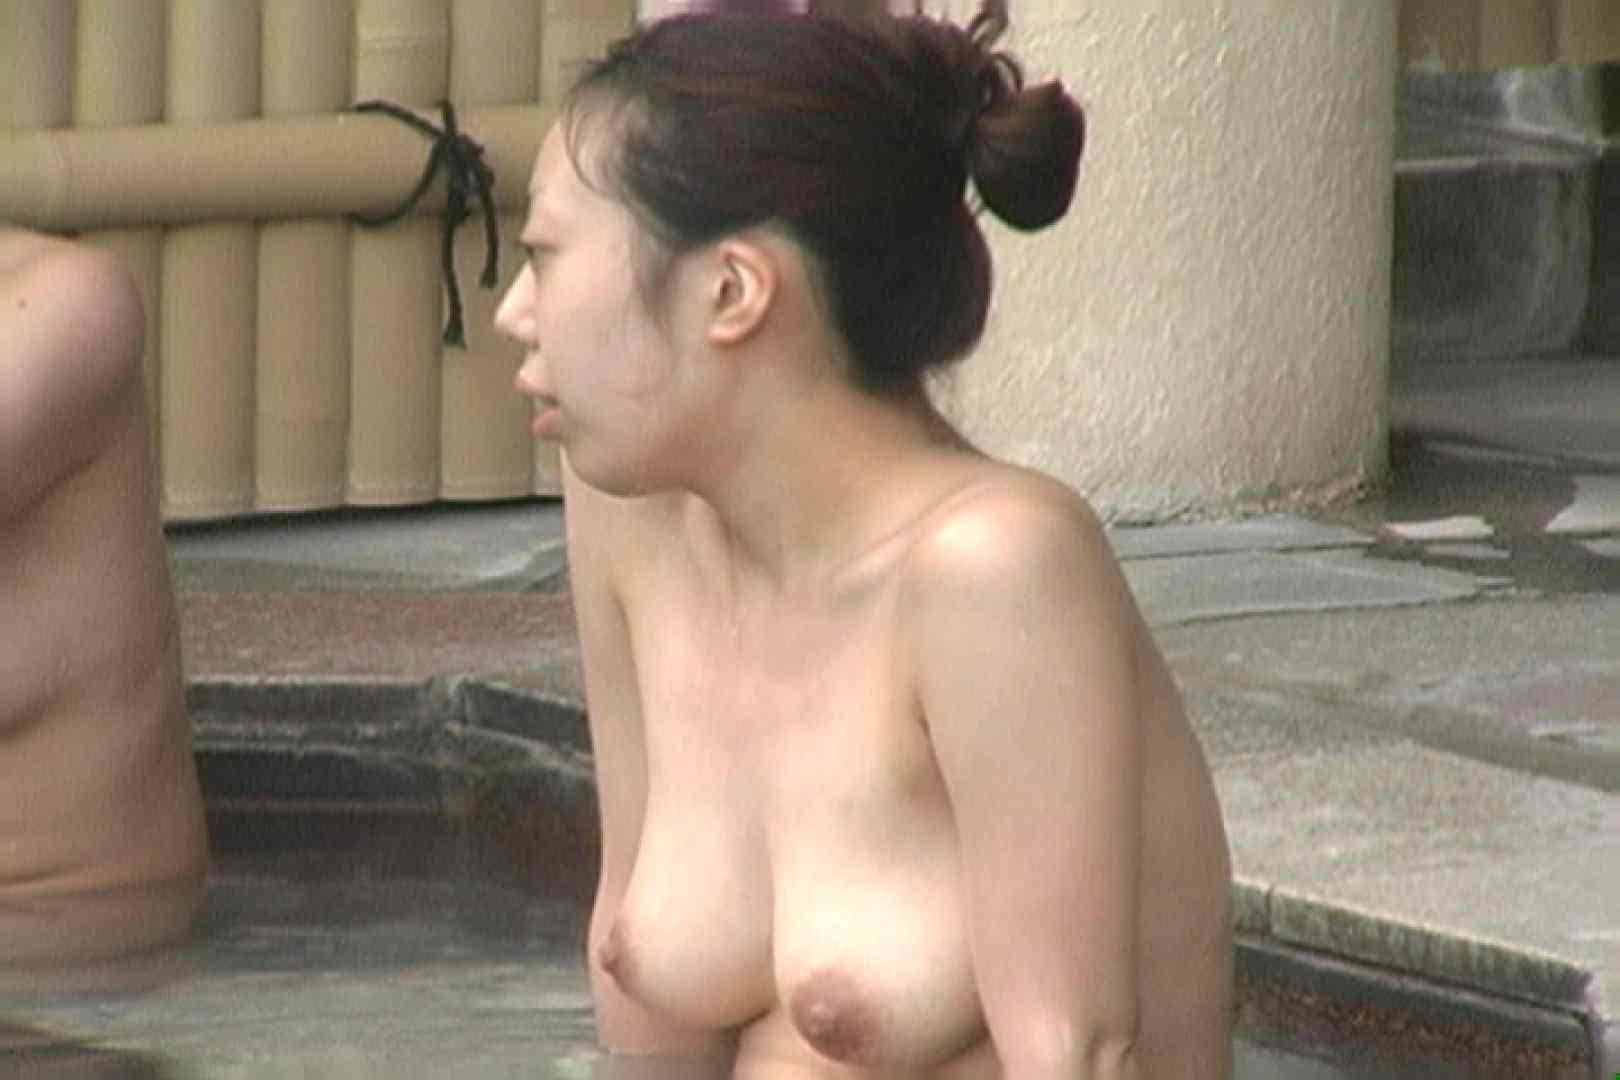 Aquaな露天風呂Vol.626 OLセックス | 盗撮  92画像 10